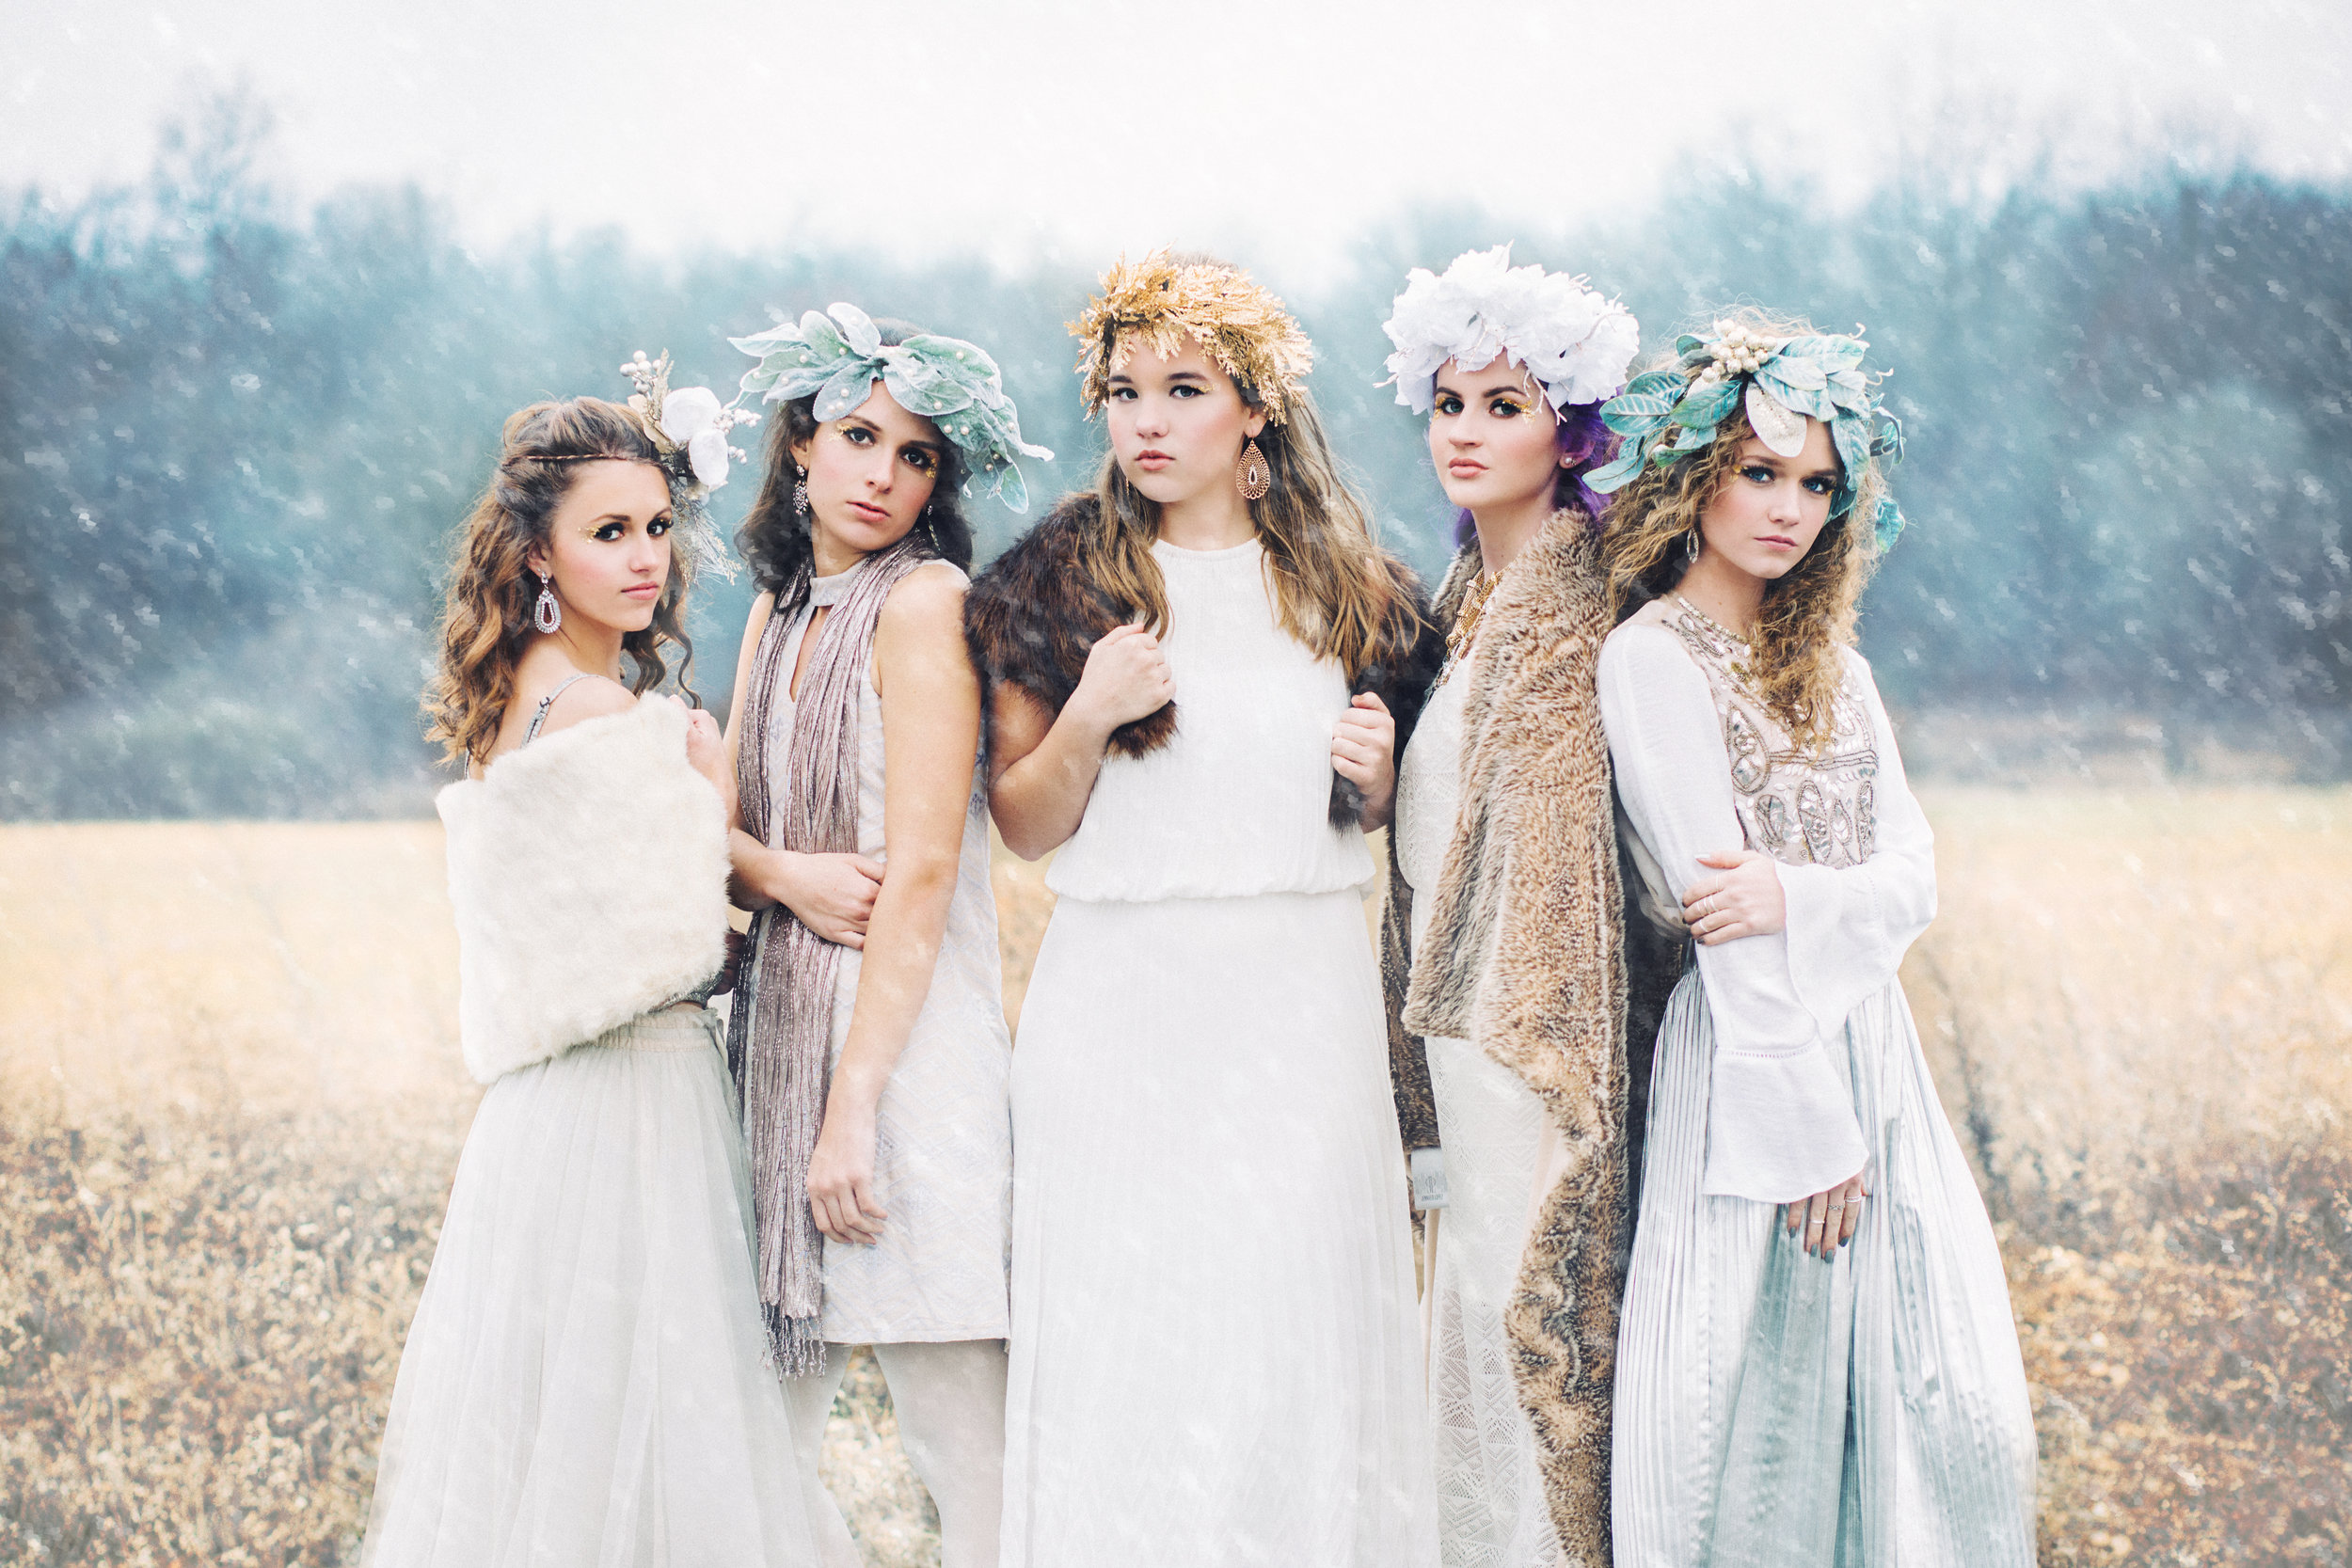 Senior Model Team 2018 during our Snow Queen Photo Shoot